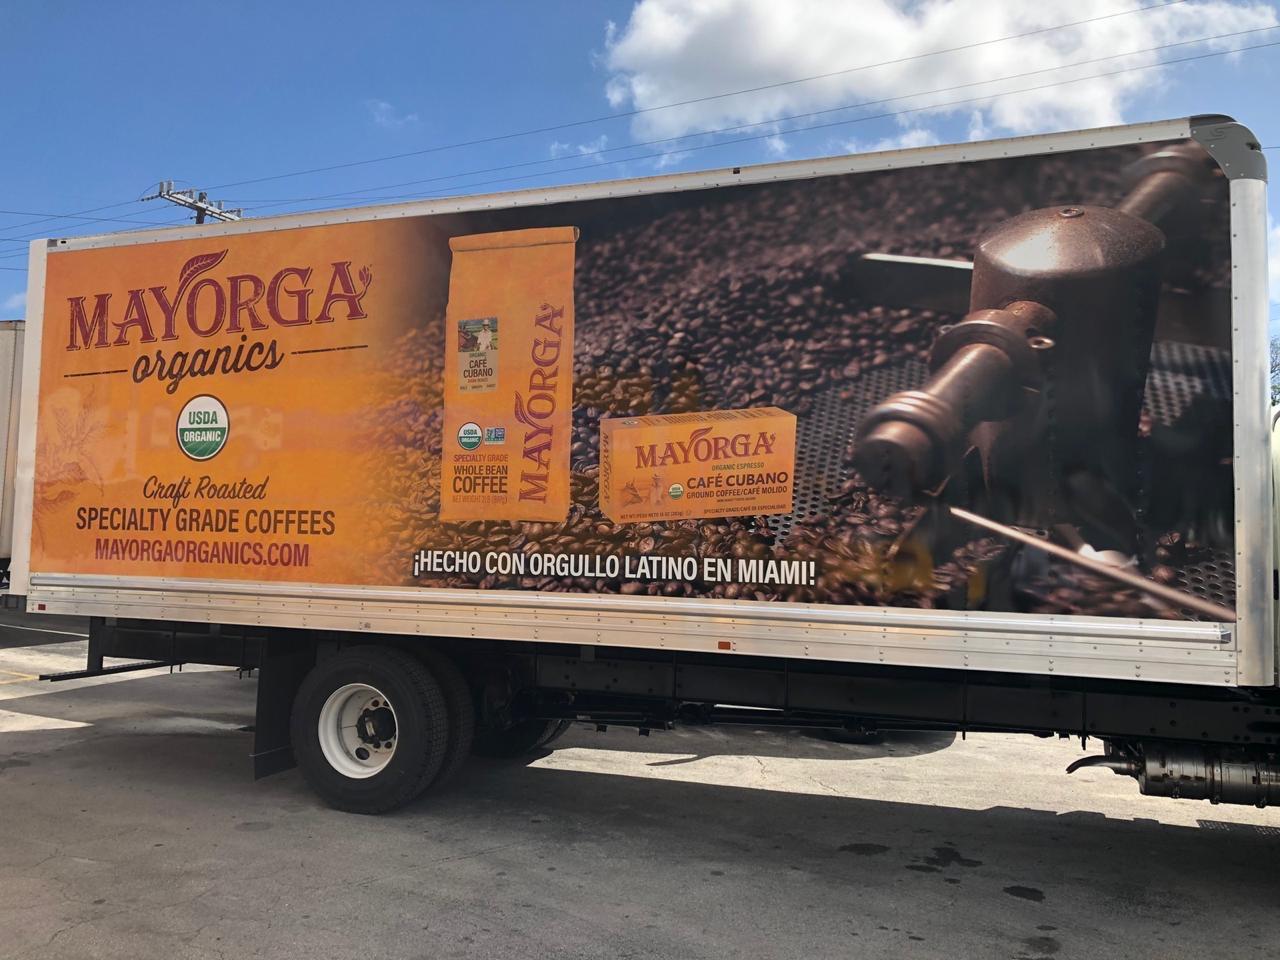 Livraison de camion à café Mayorga Organics